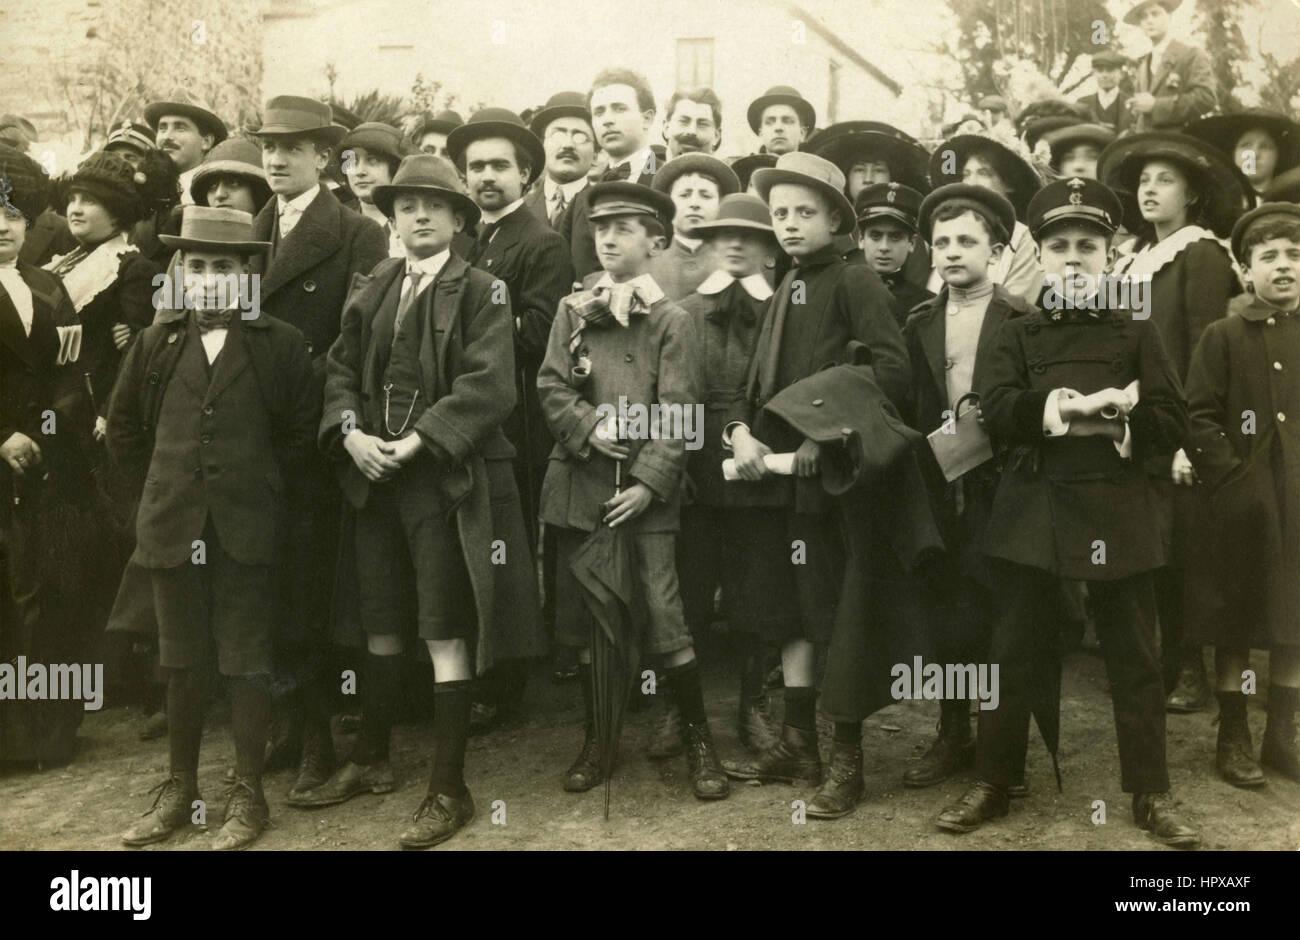 Elegant children at a gathering, Italy 1915 - Stock Image